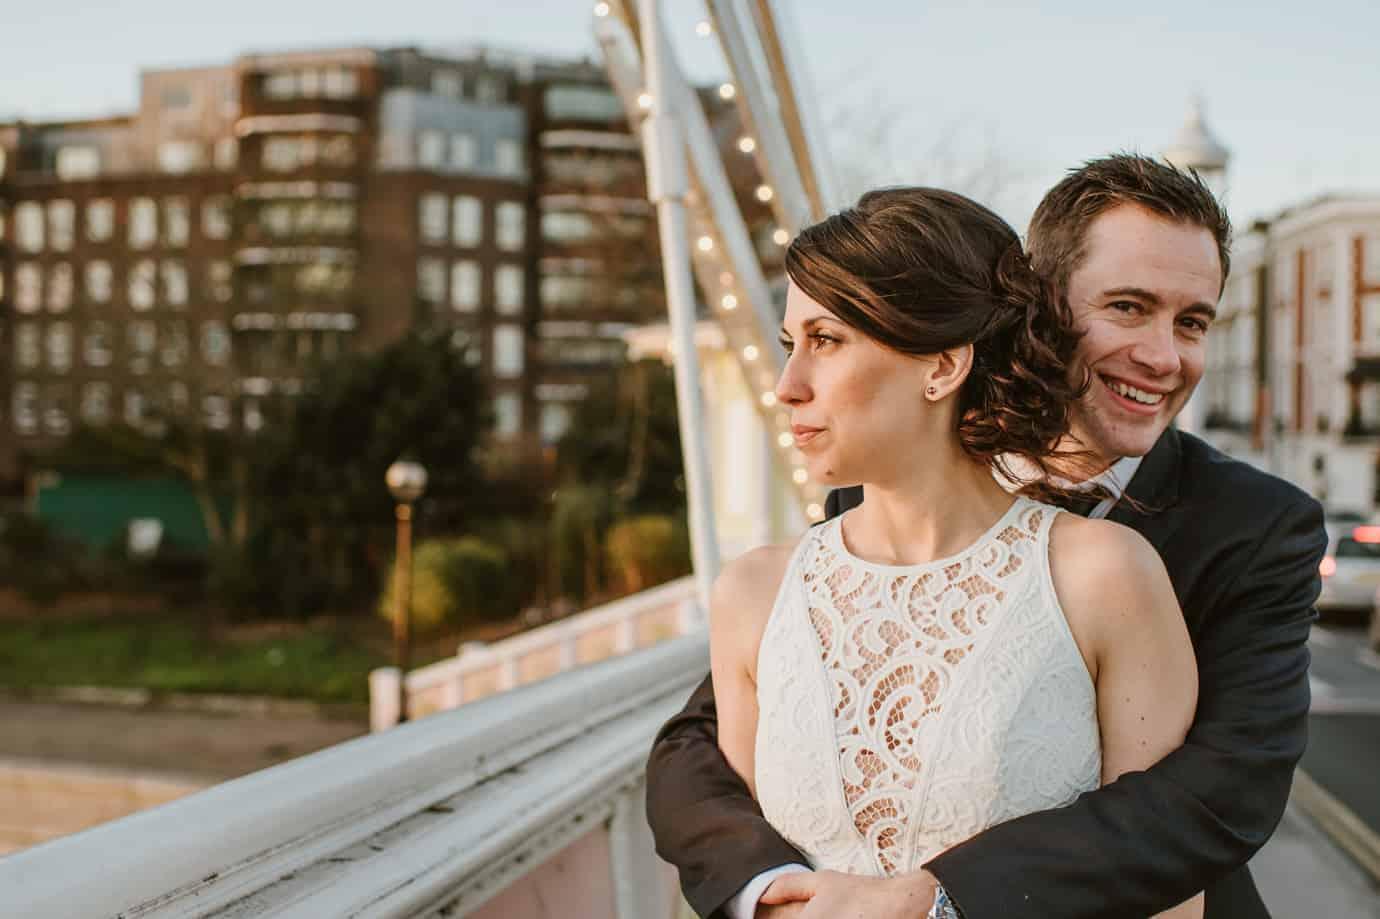 Dan & Leia's casual London wedding at Chelsea Town Hall